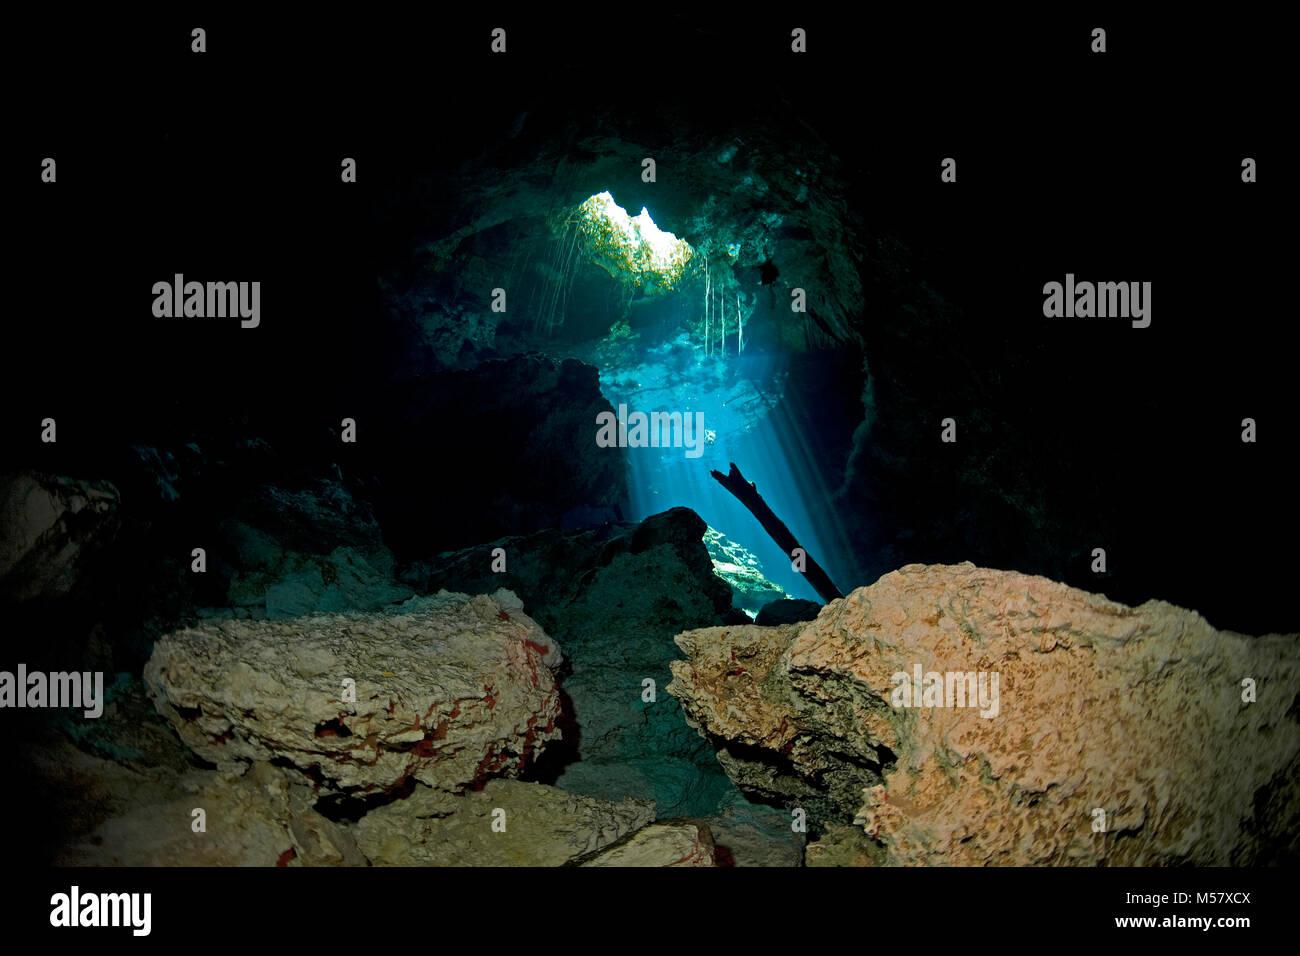 Sunbeams suffuse crystal clear water of cenote Taj Mahal, Cenotes, Tulum, Yucatan, Quintana Roo, Mexico, Caribbean - Stock Image